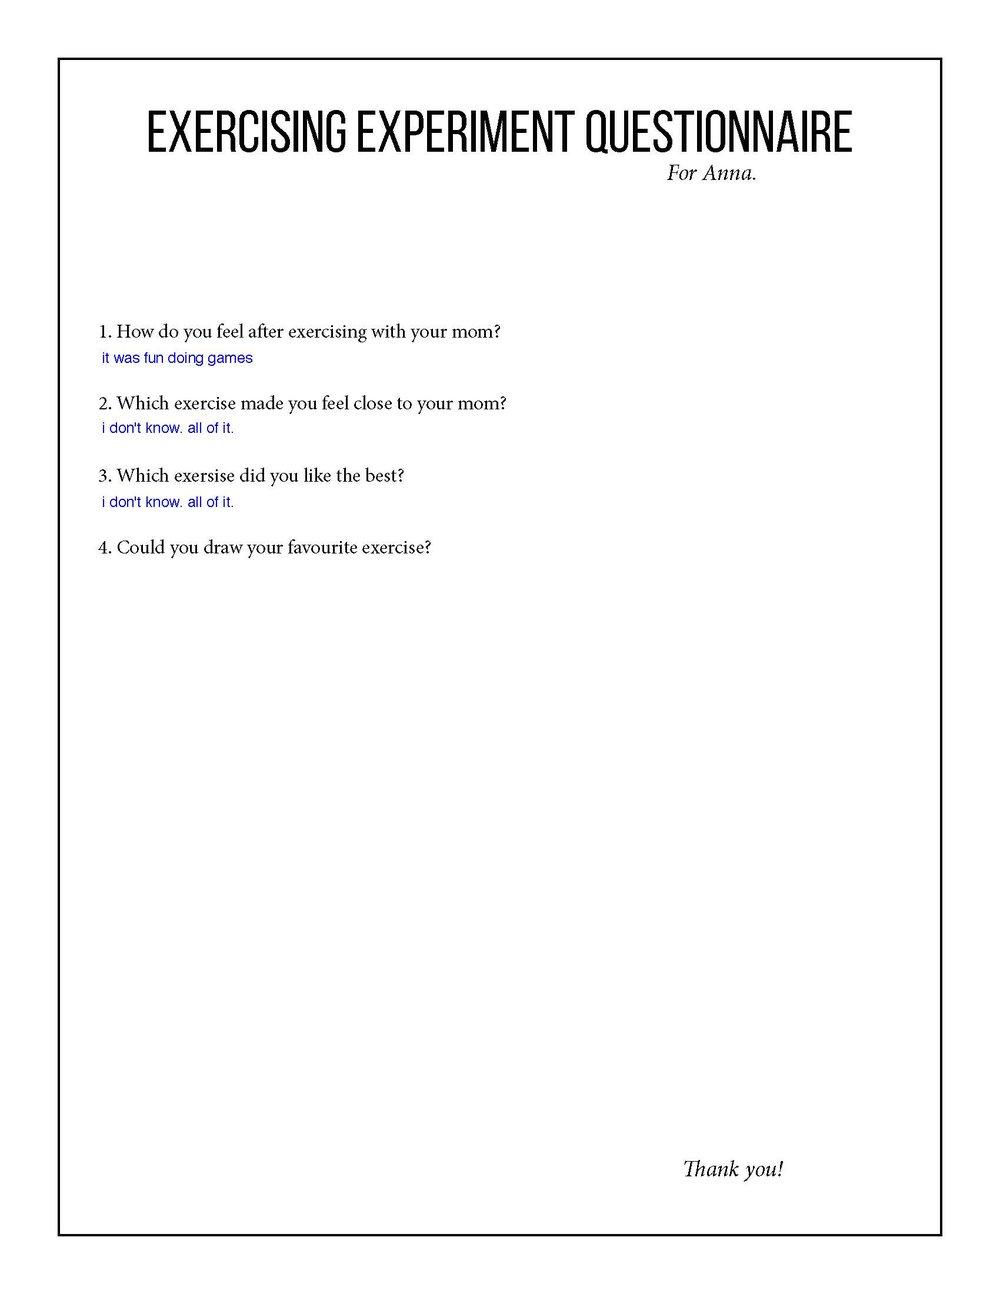 Questionnaire Claudia & Anna_Page_2.jpg